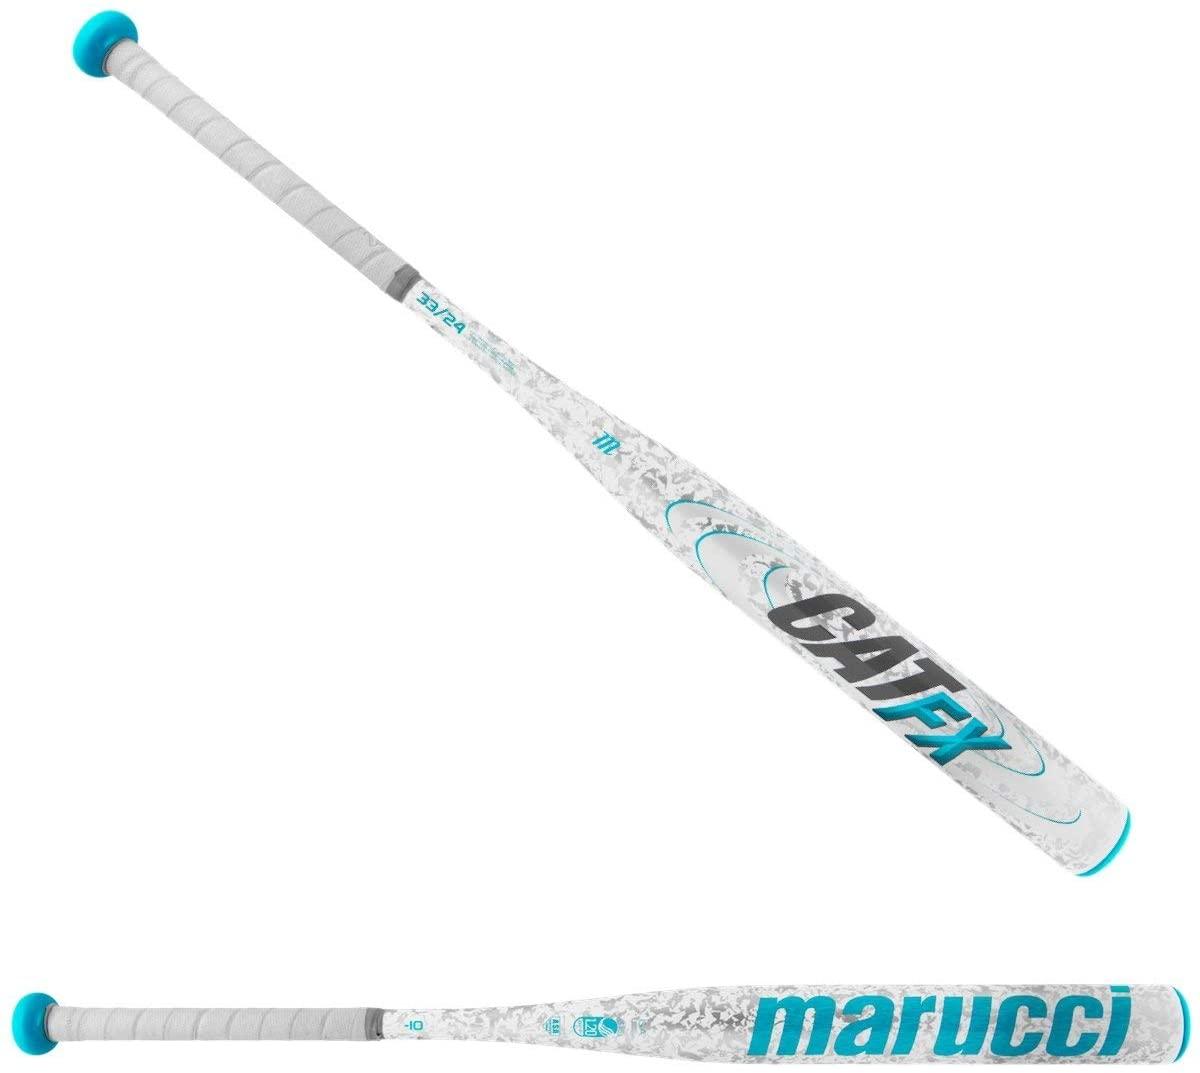 marucci-mfpc710-cat-fx-fast-pitch-softball-bats-33-in-23-oz MFPC710-3323 Marucci  One-piece composite construction - All-season durability maximum trampoline AV2 Knob -